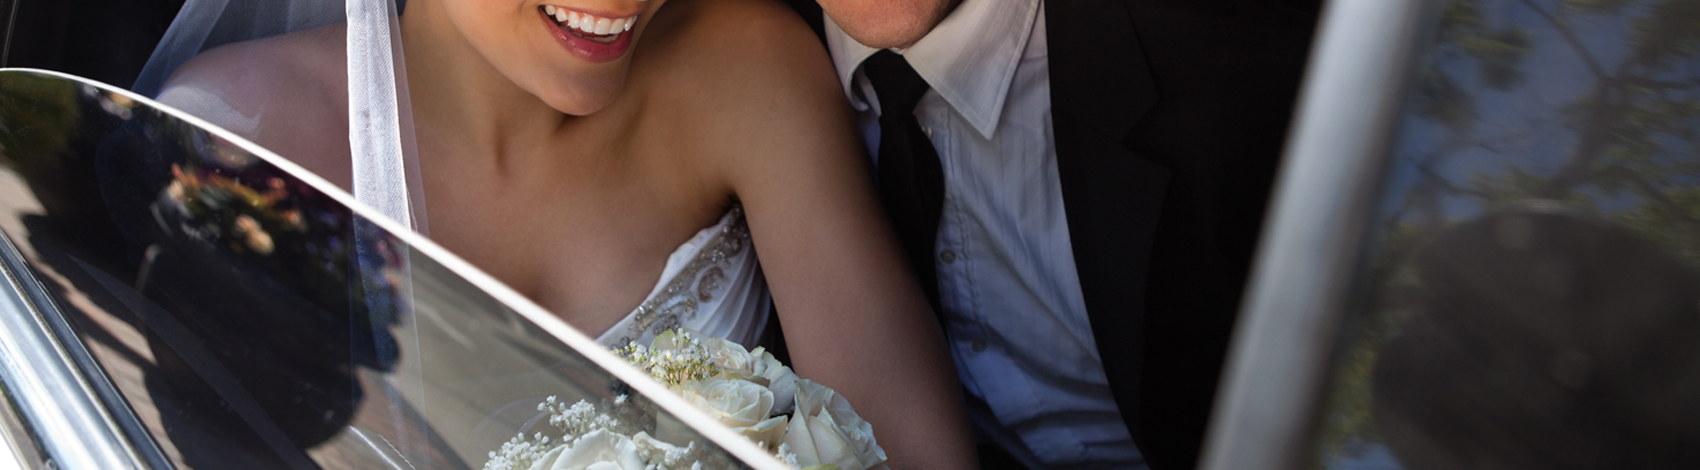 Voiture mariage orléans